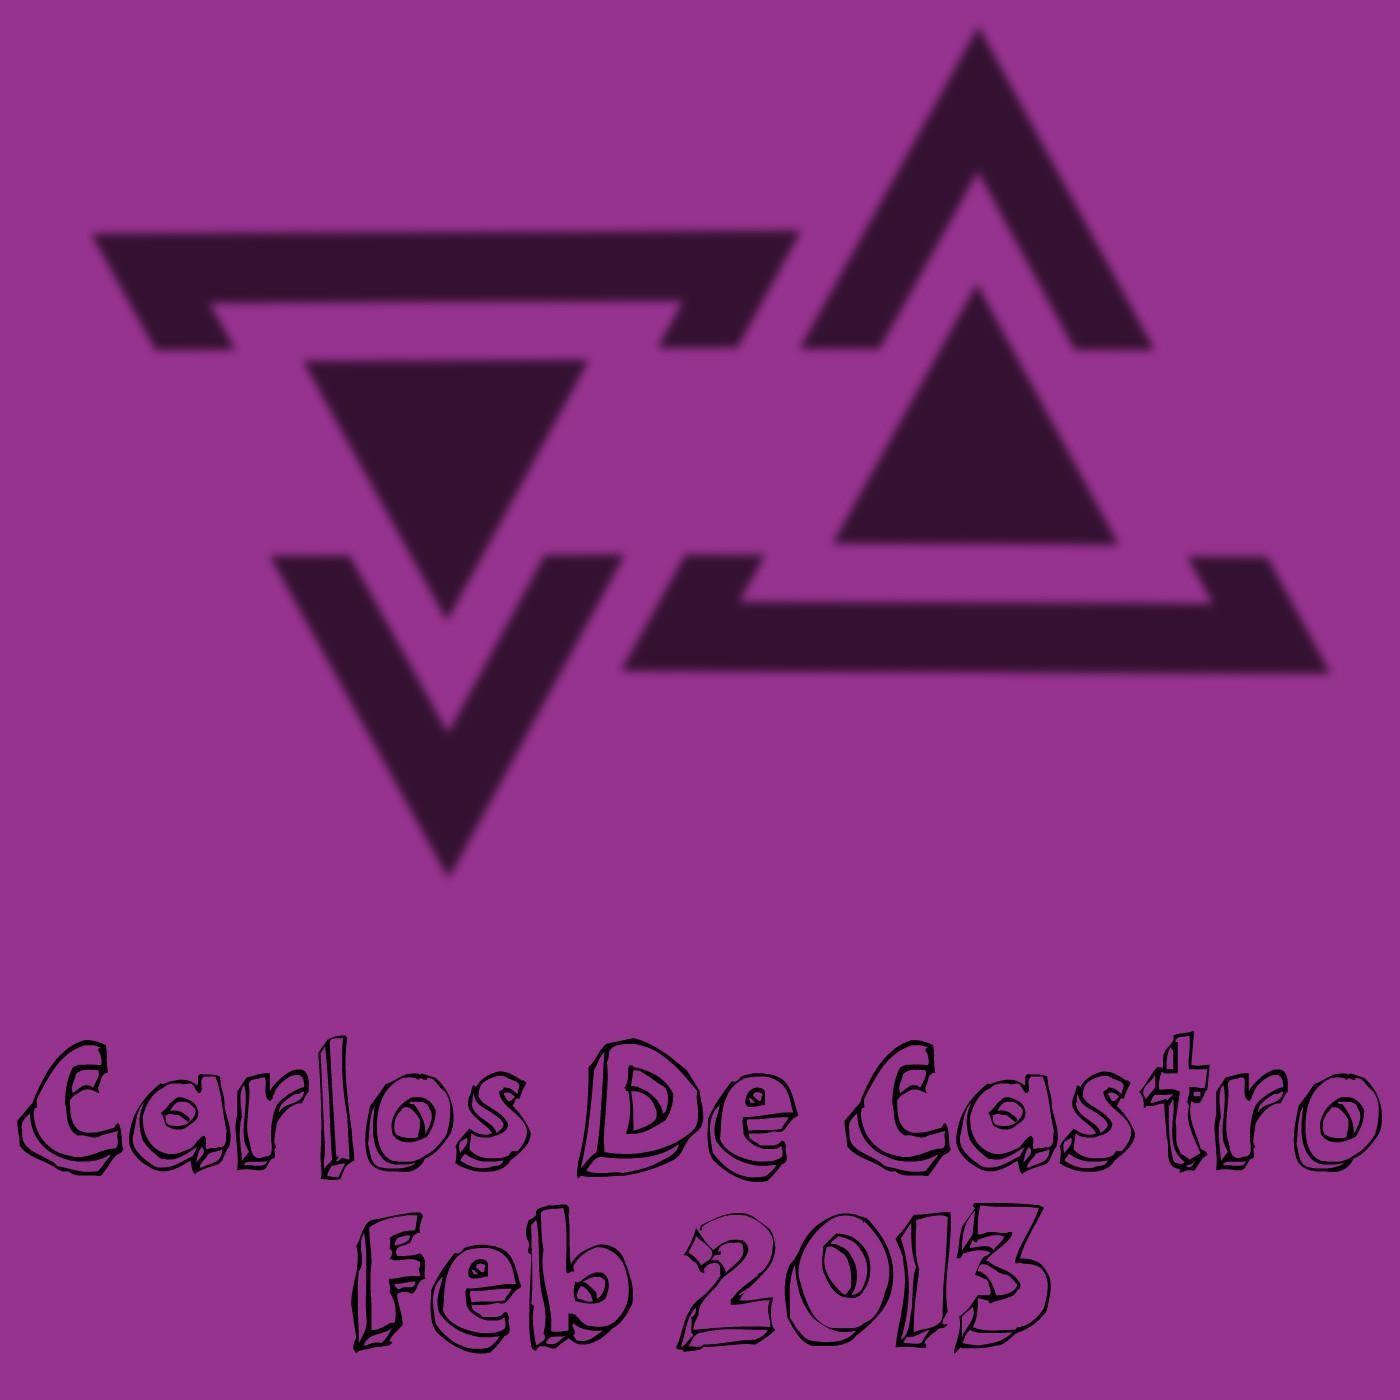 <![CDATA[Mix_Feb 2013]]>